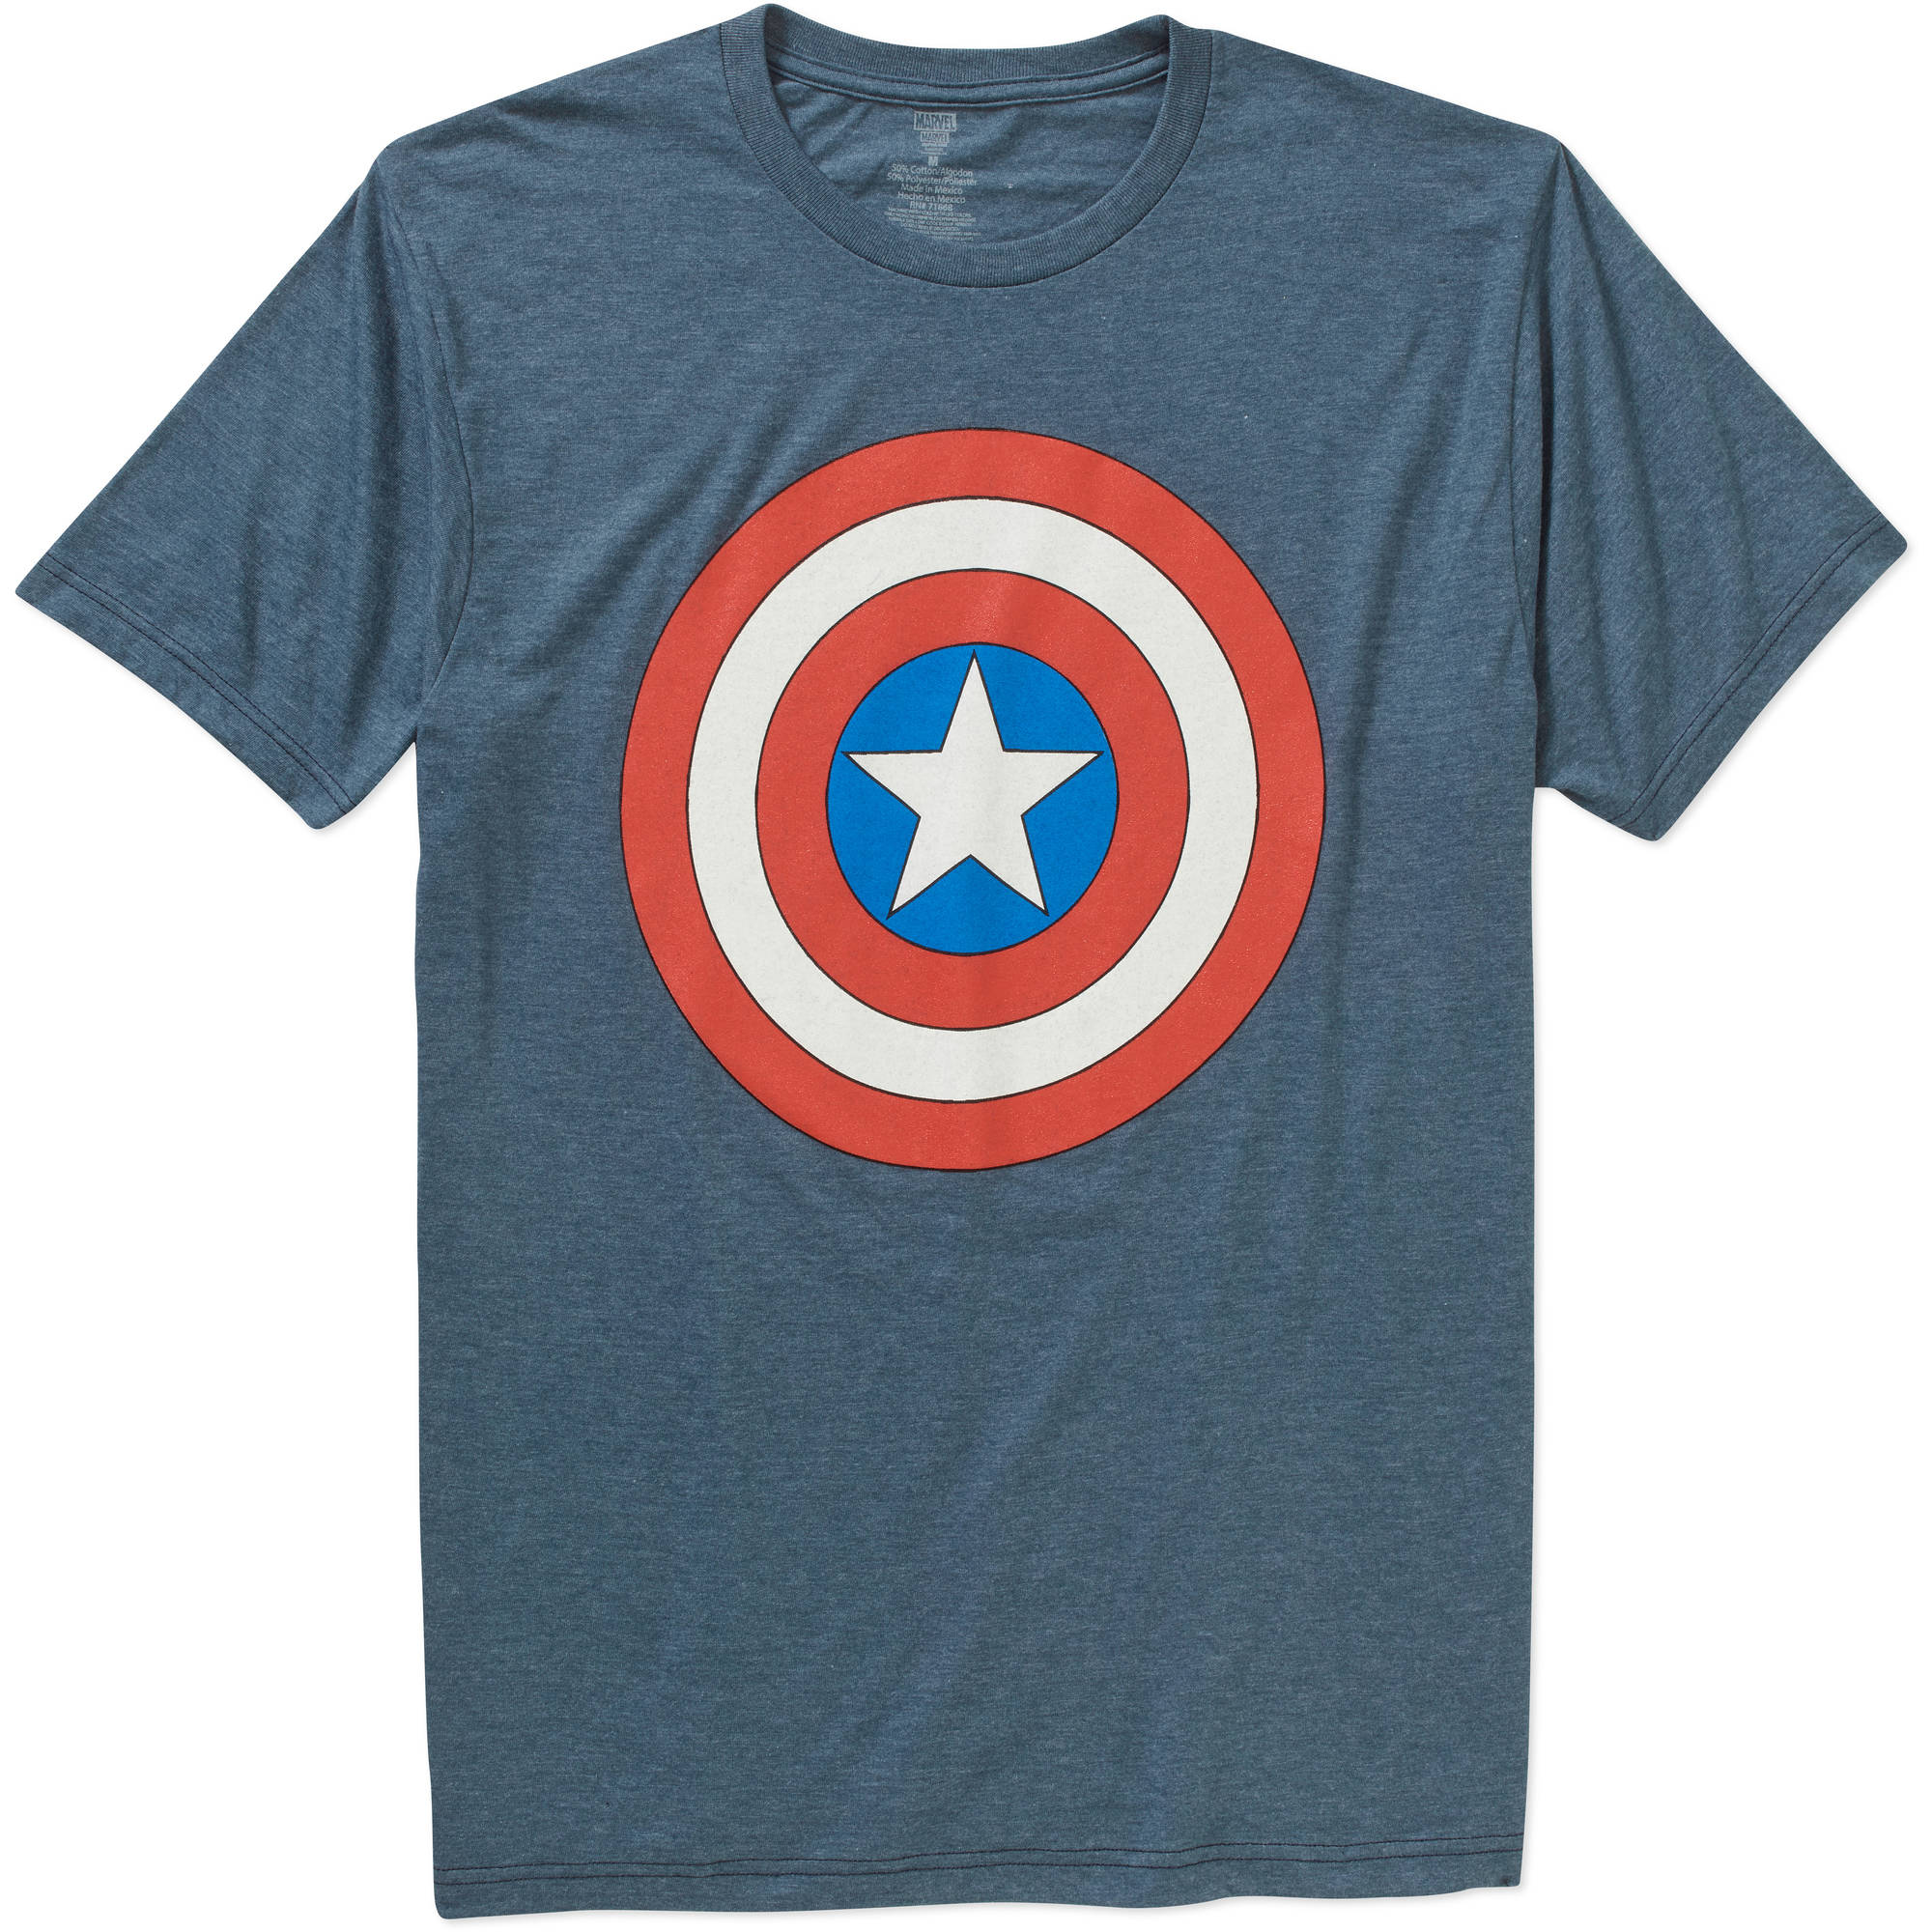 Marvel Big Men's Captain America Shield Short Sleeve Graphic T-shirt, 2XL